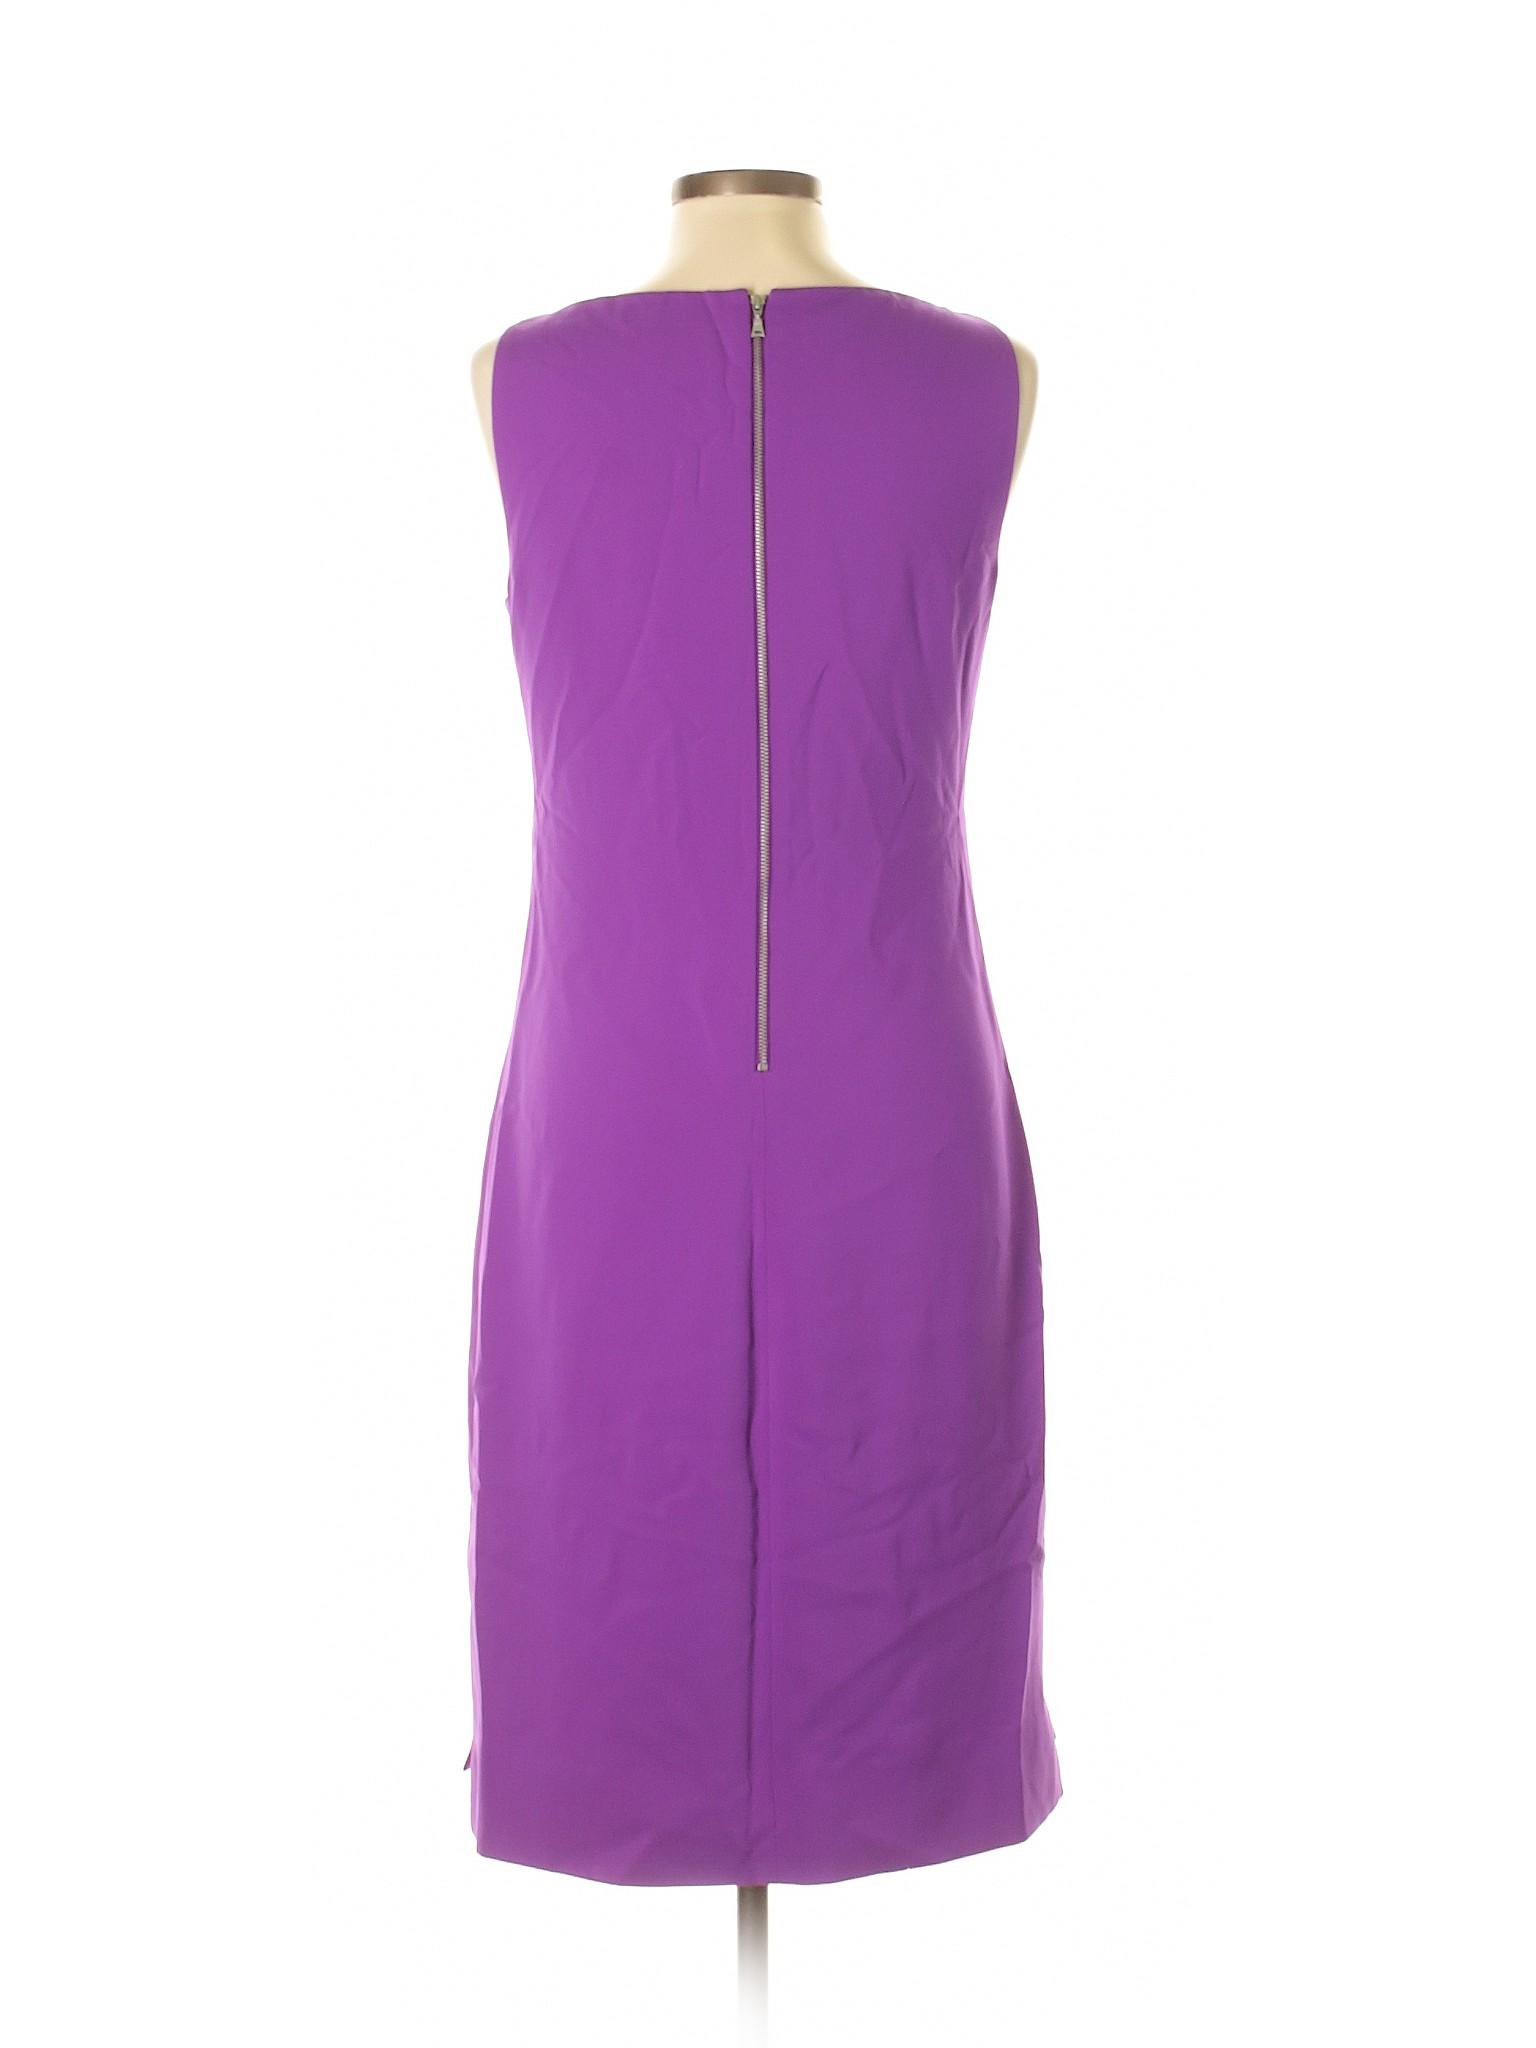 Dress Selling Selling Tahari Tahari Casual xZ1WwqzPBU